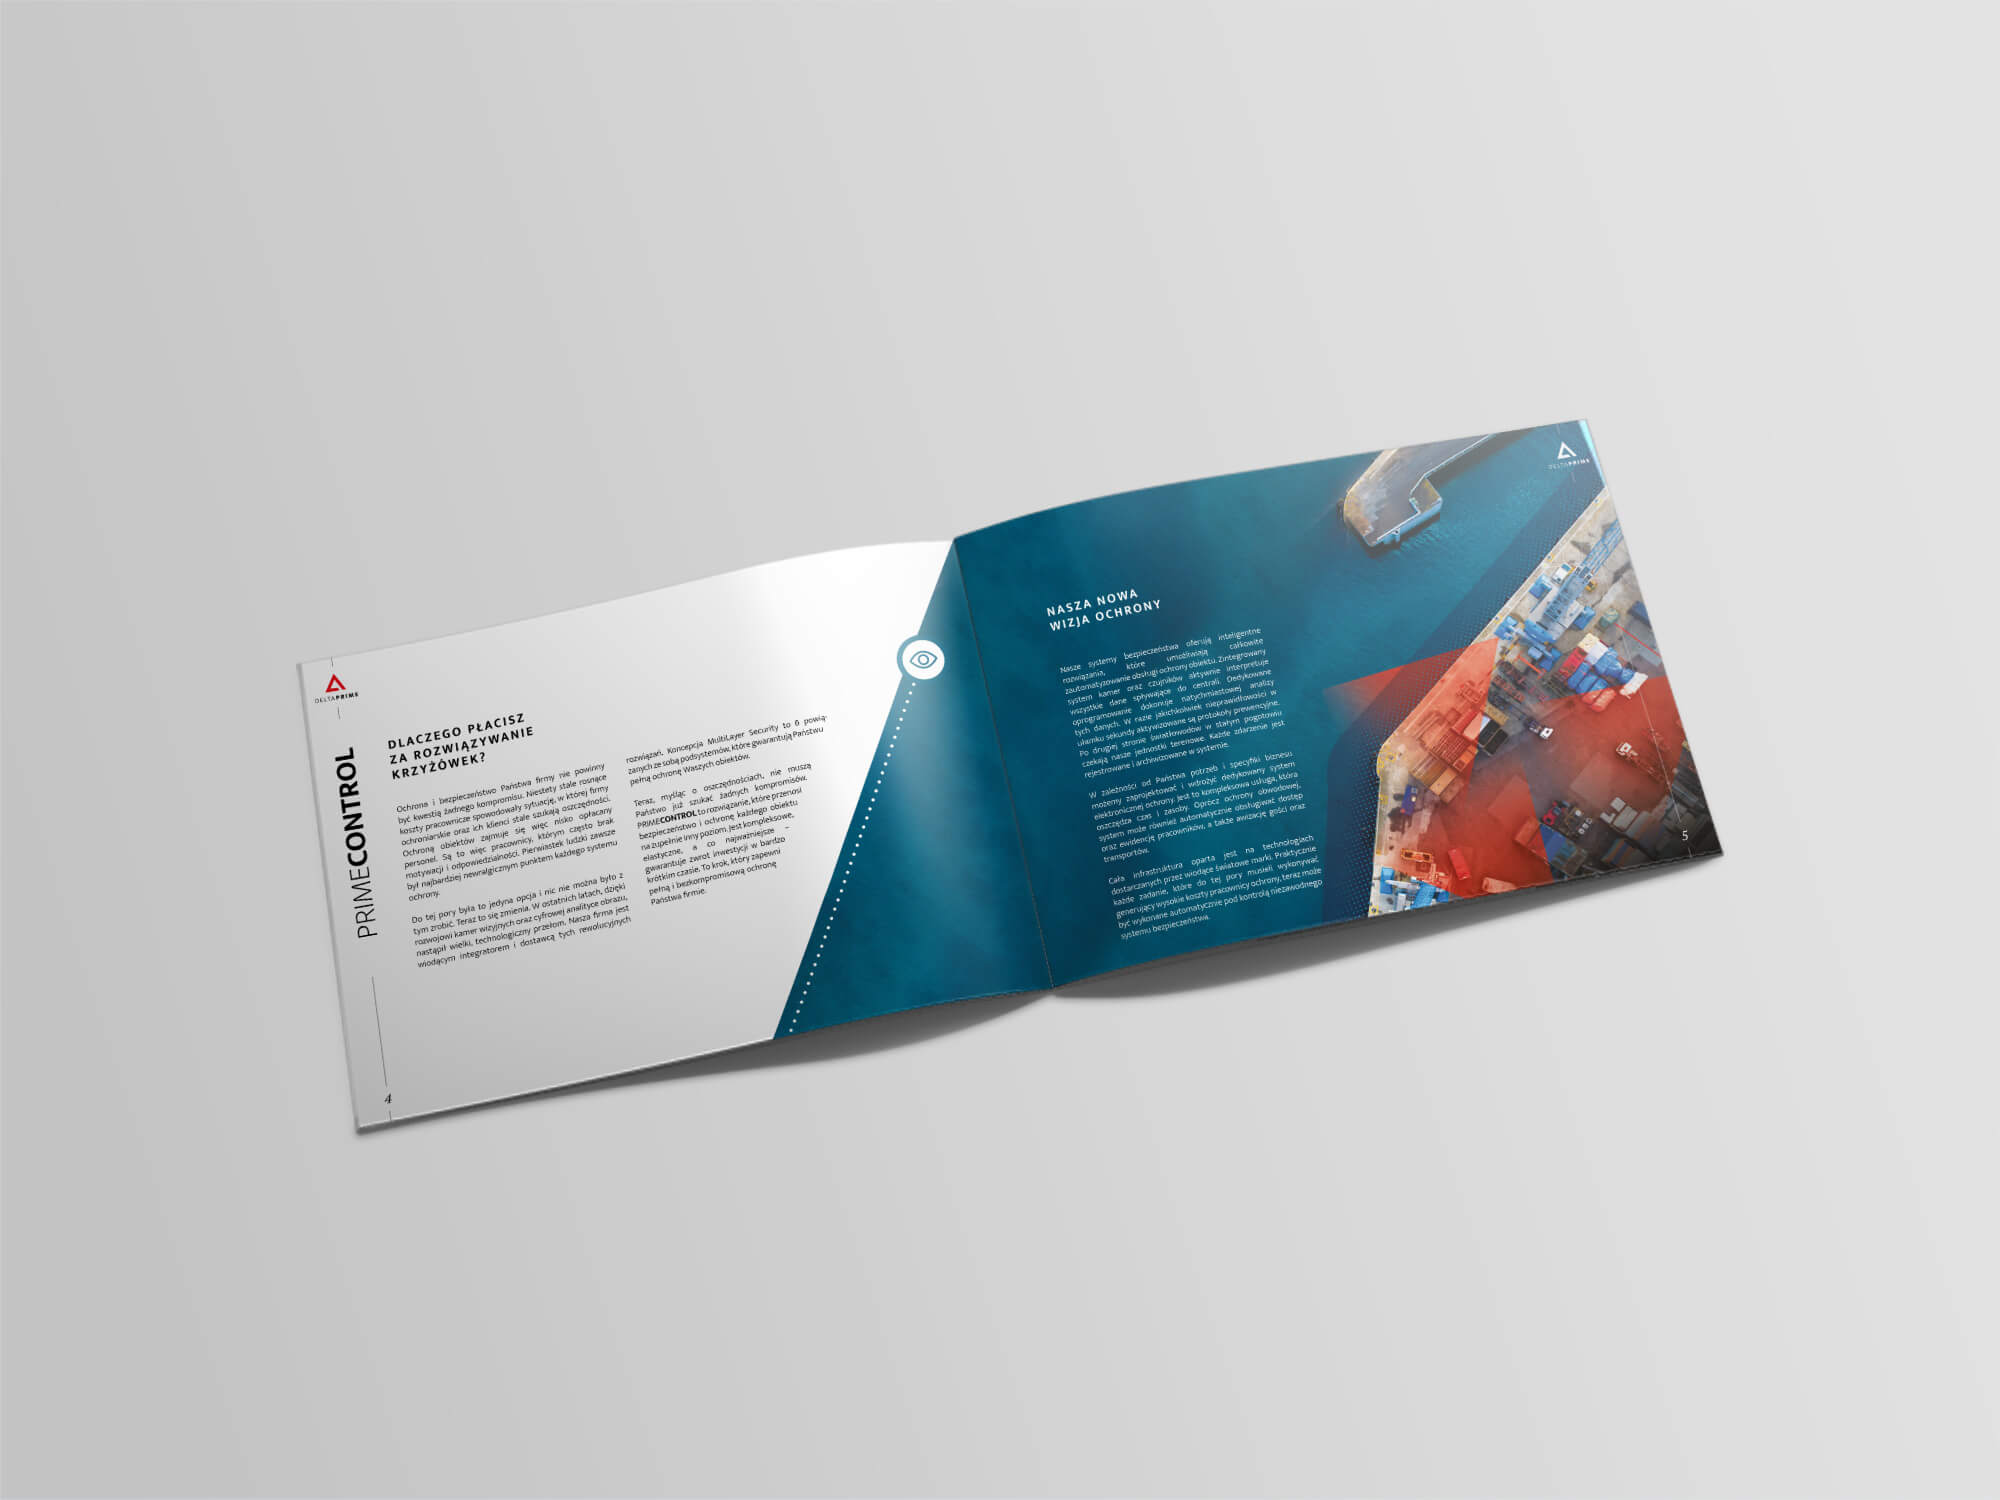 DELTAPRIME wizualizacja katalogu / broszury - poligrafia